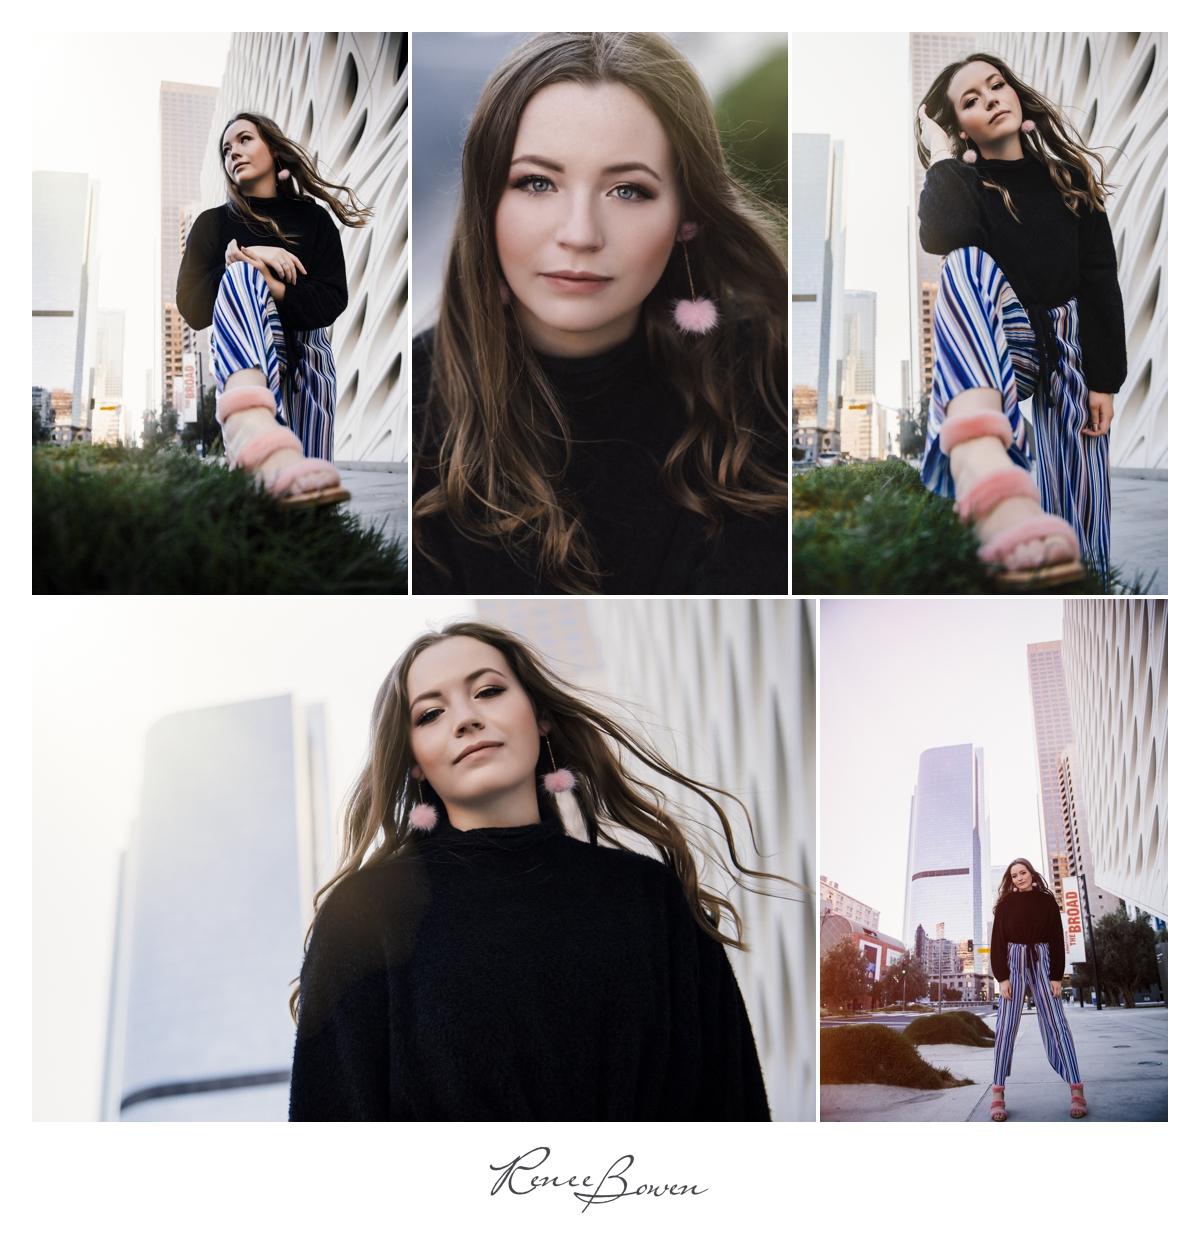 girl in black sweater on street los angeles